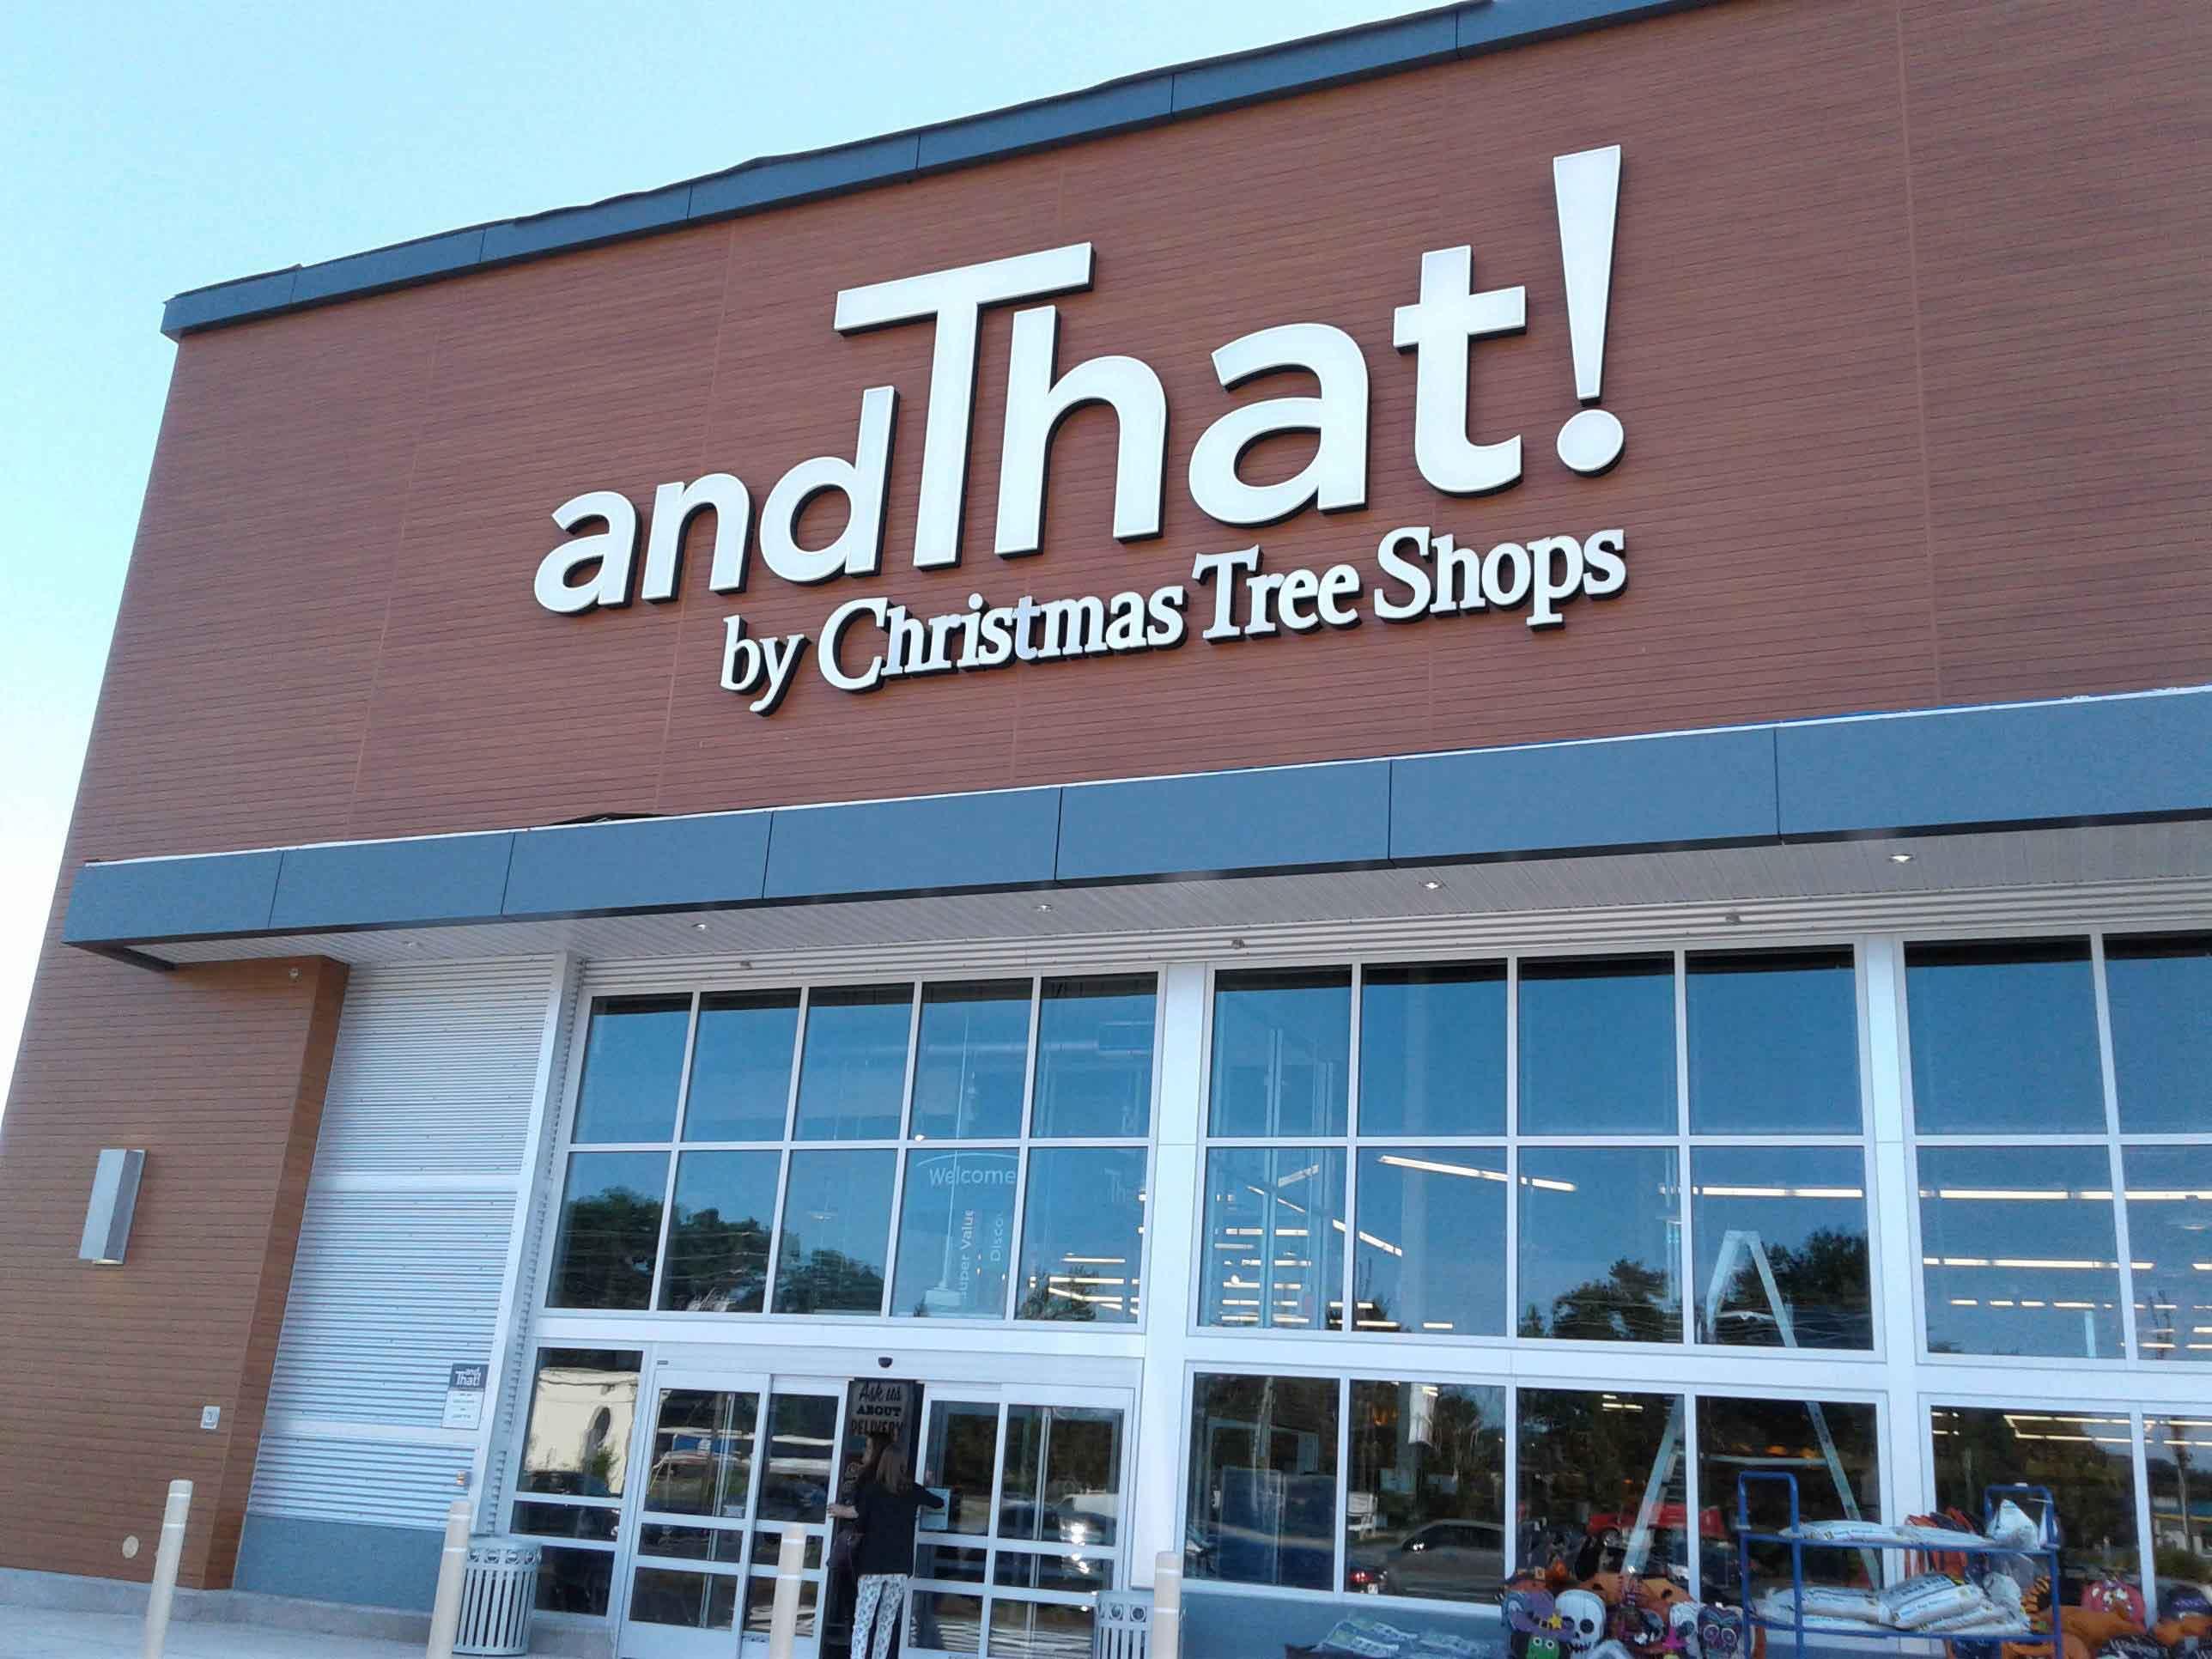 Christmas-Tree-Shop-Furniture-christmas-tree-shop-outdoor-furniture